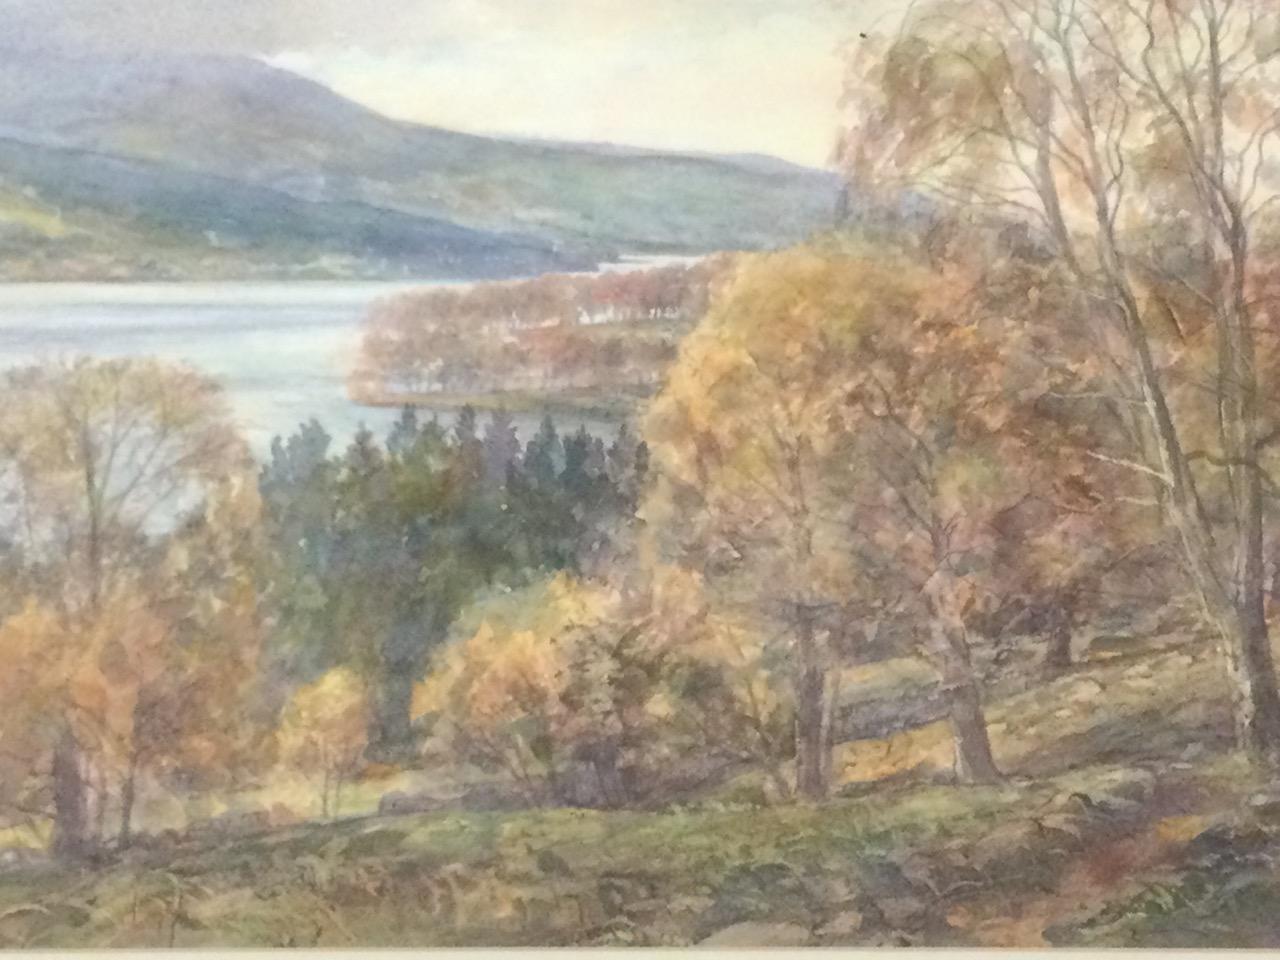 John Fisher, watercolour, Scottish landscape, inscribed to label verso Loch Tummel & Schiehallion, - Image 3 of 3